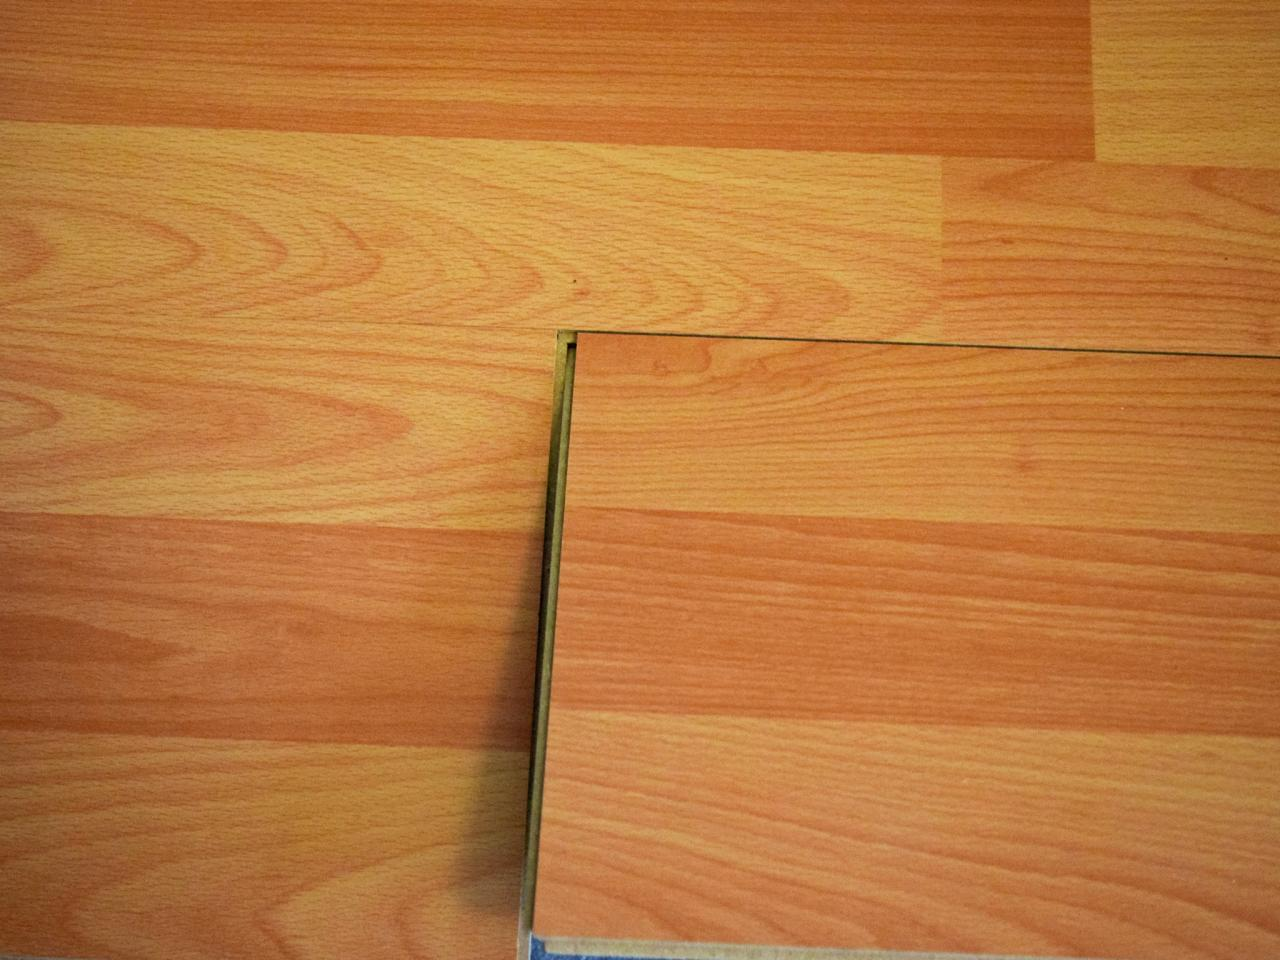 Wood laminate flooring cost square foot wood laminate for Square laminate flooring